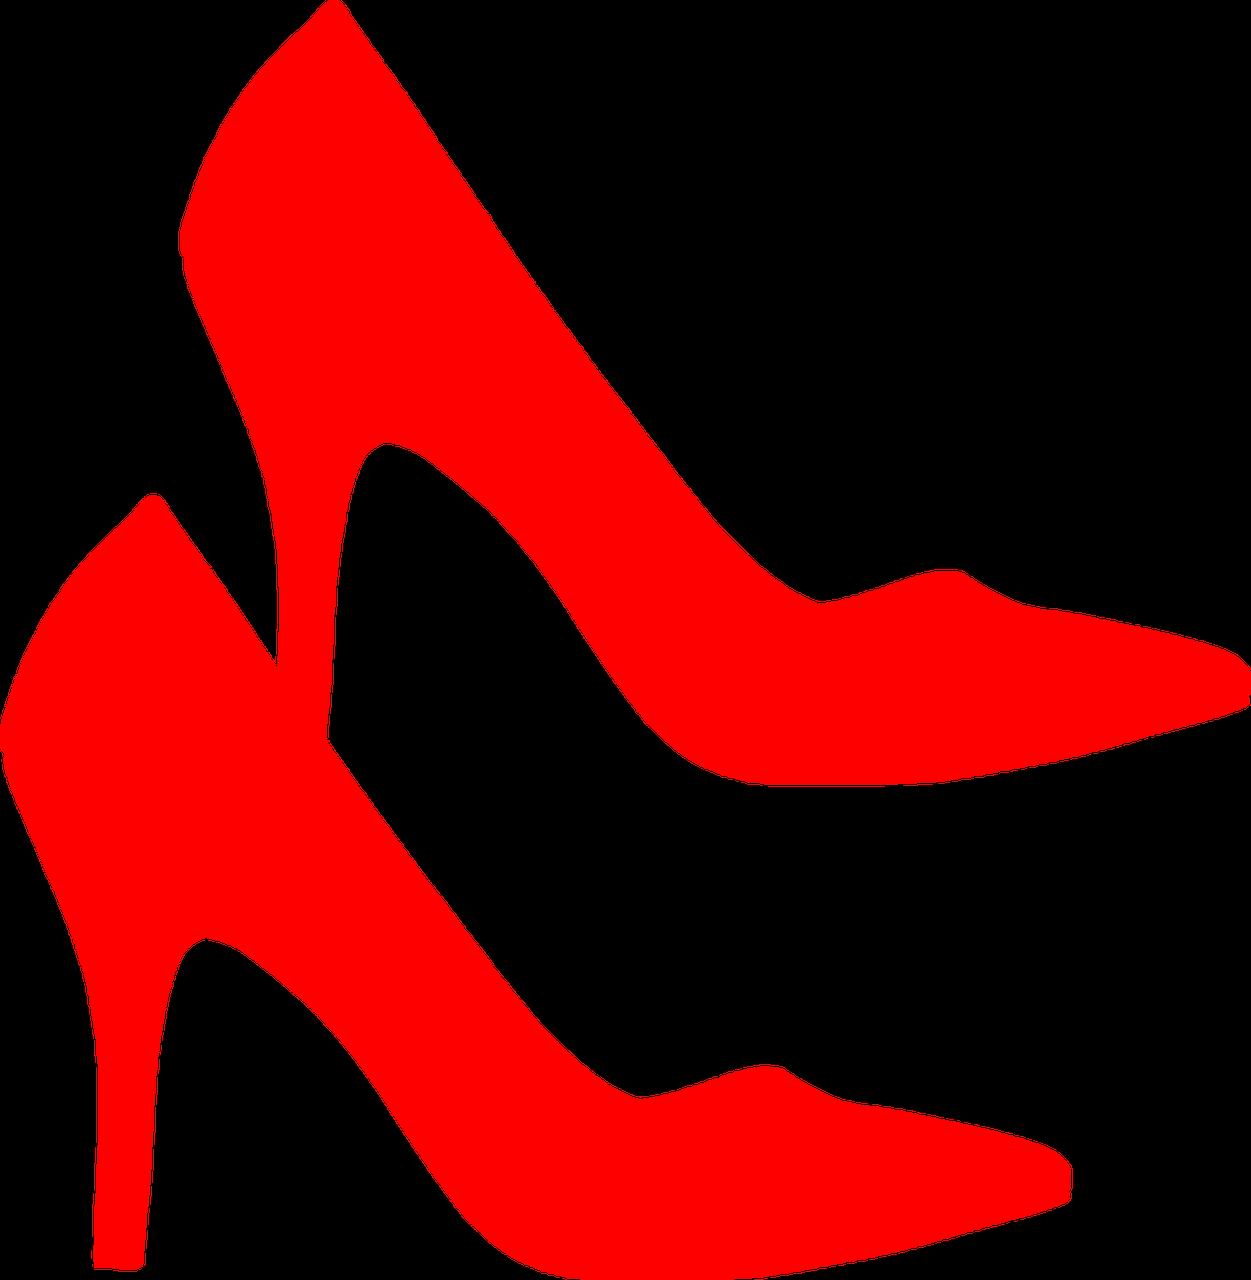 Картинки изображение обуви